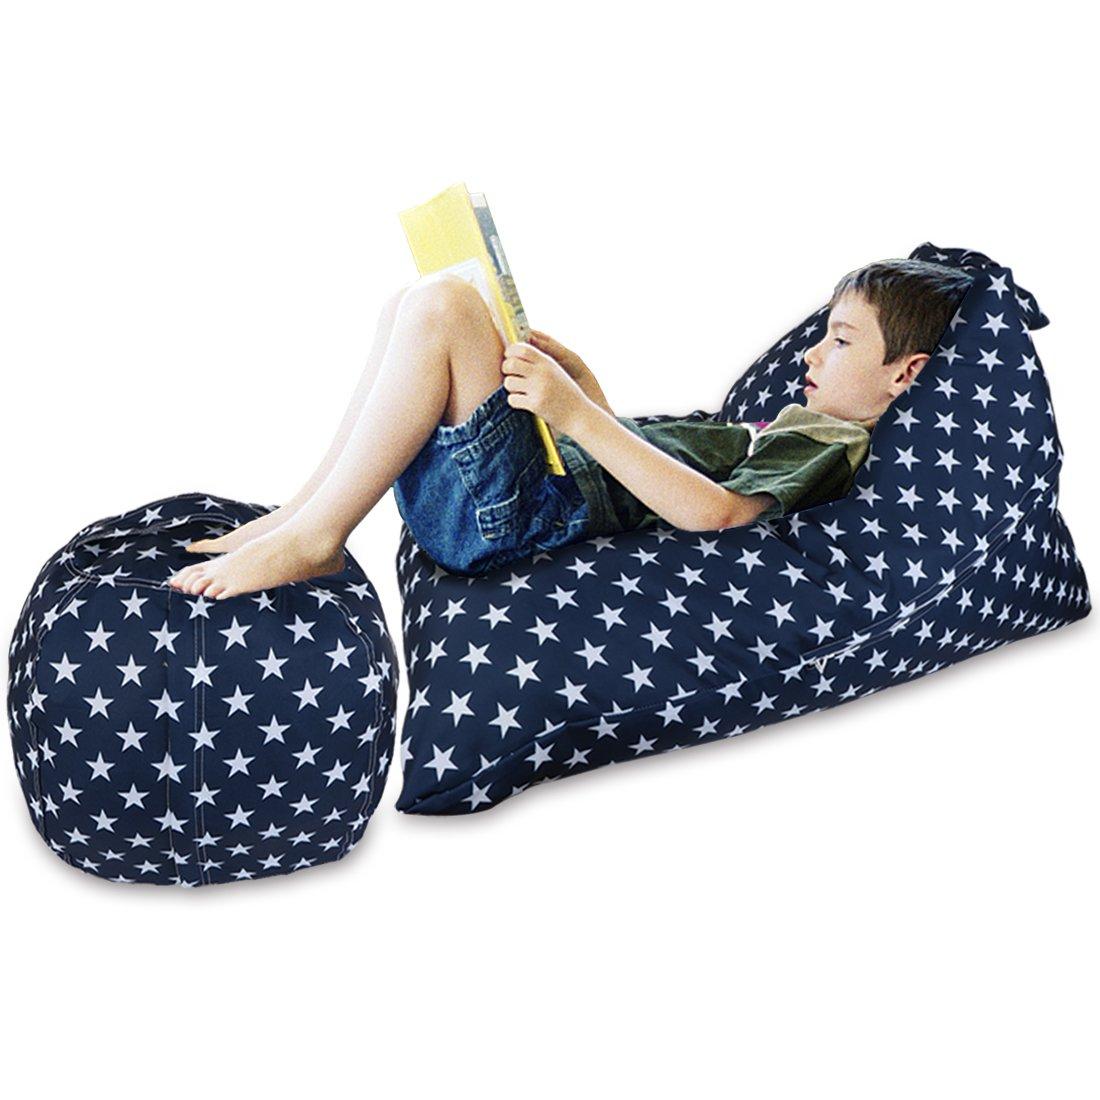 YellowPin 2pc Stuffed Animal Bean Bag Storage Lounger Chair Round Ottoman Value Set